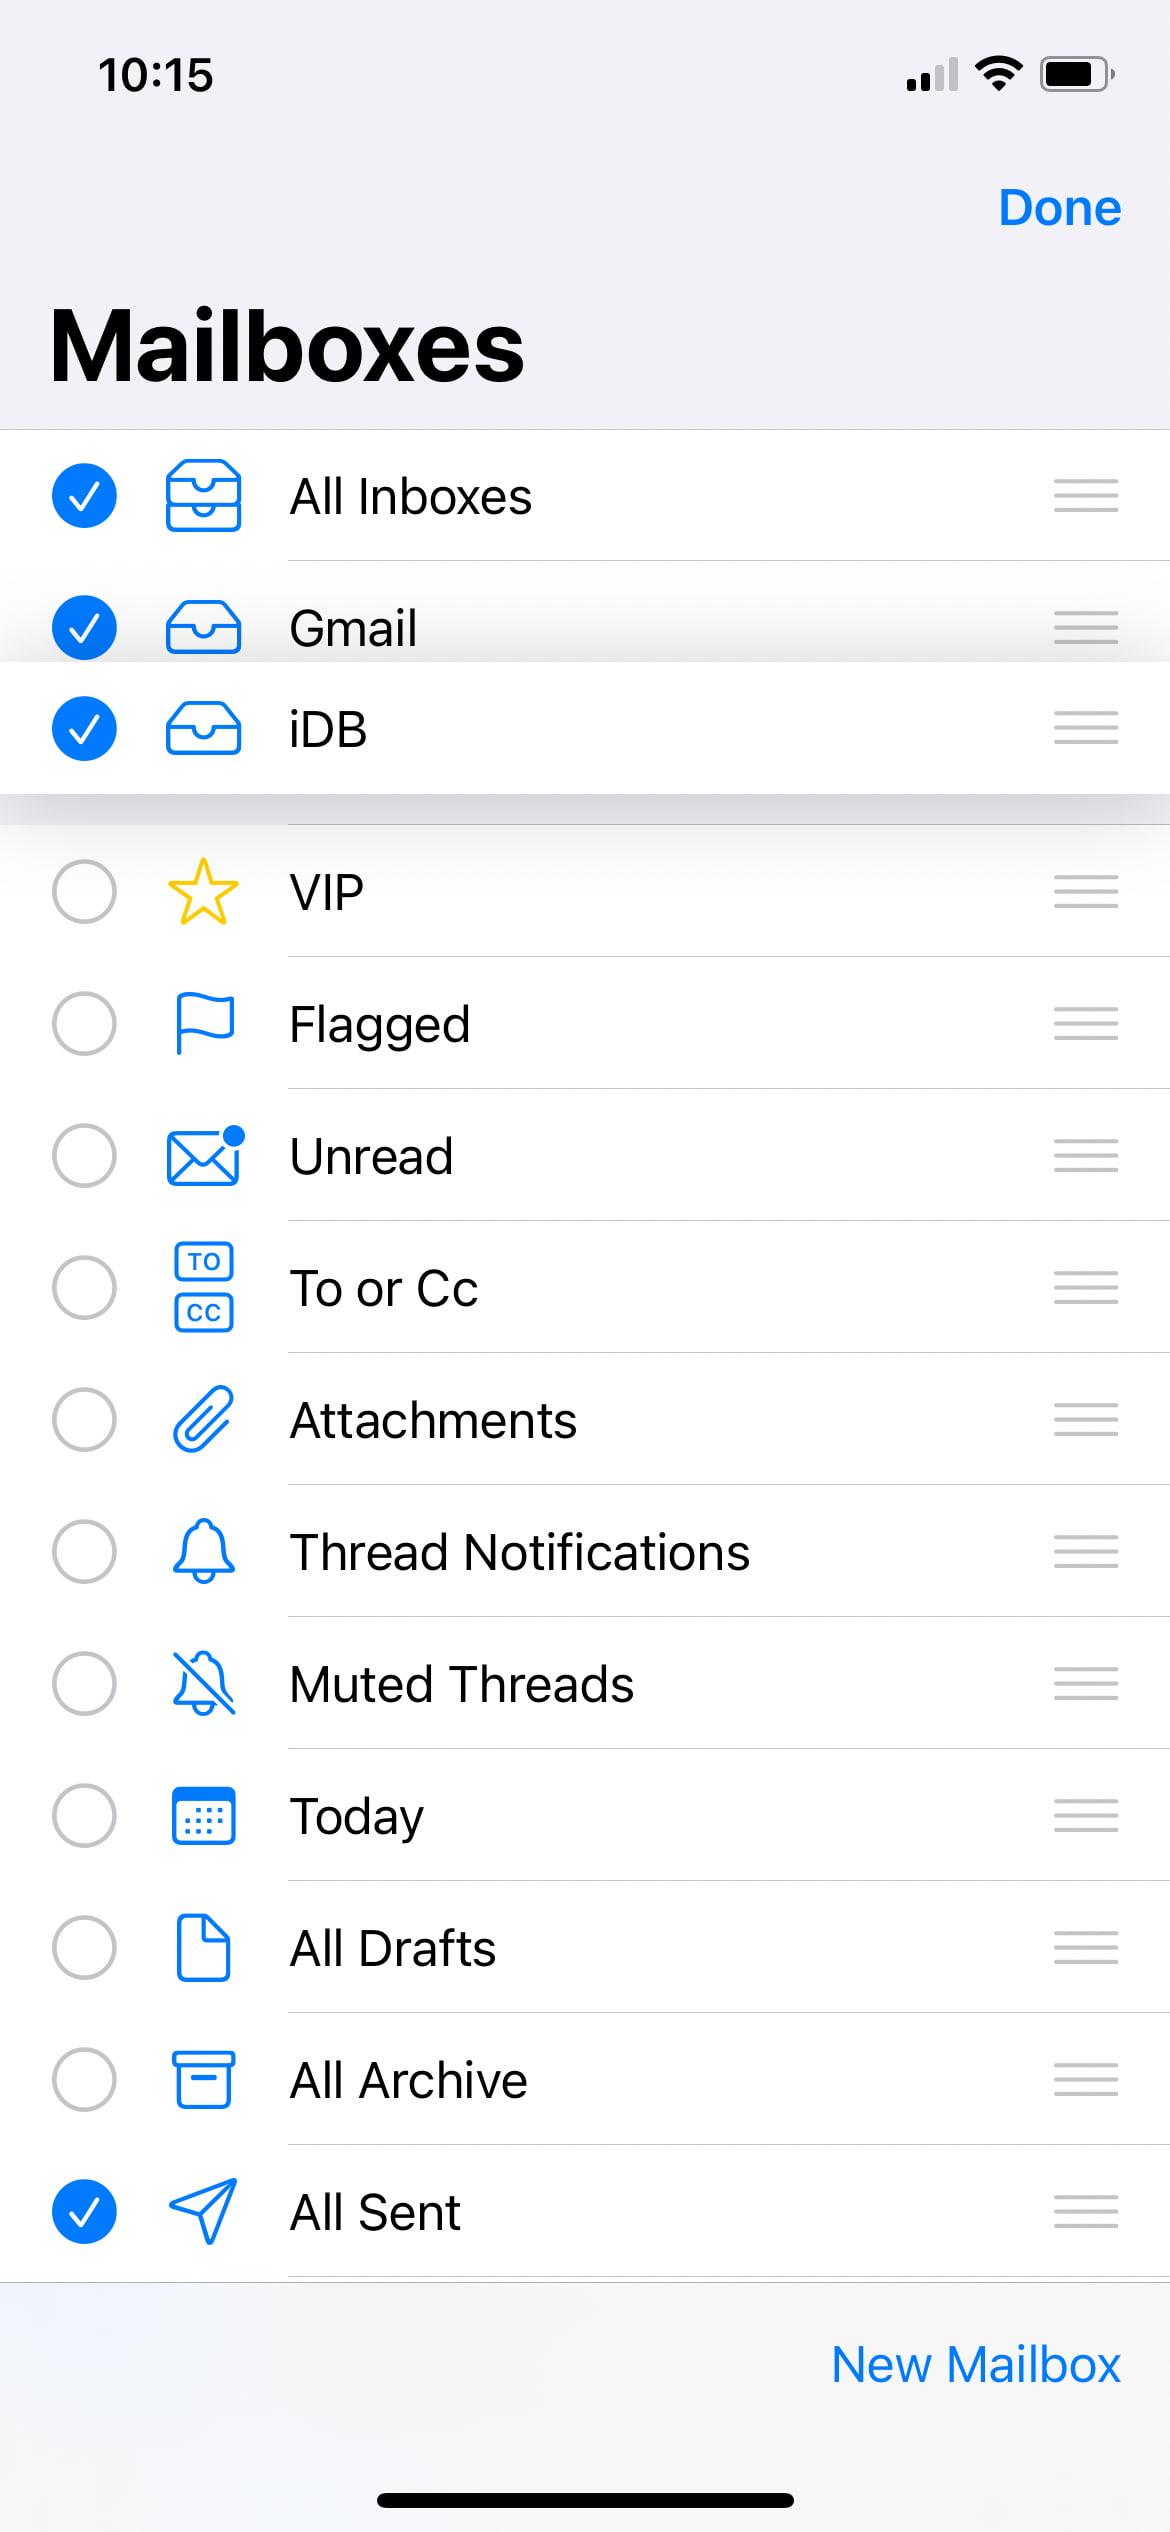 Rearrange mailboxes